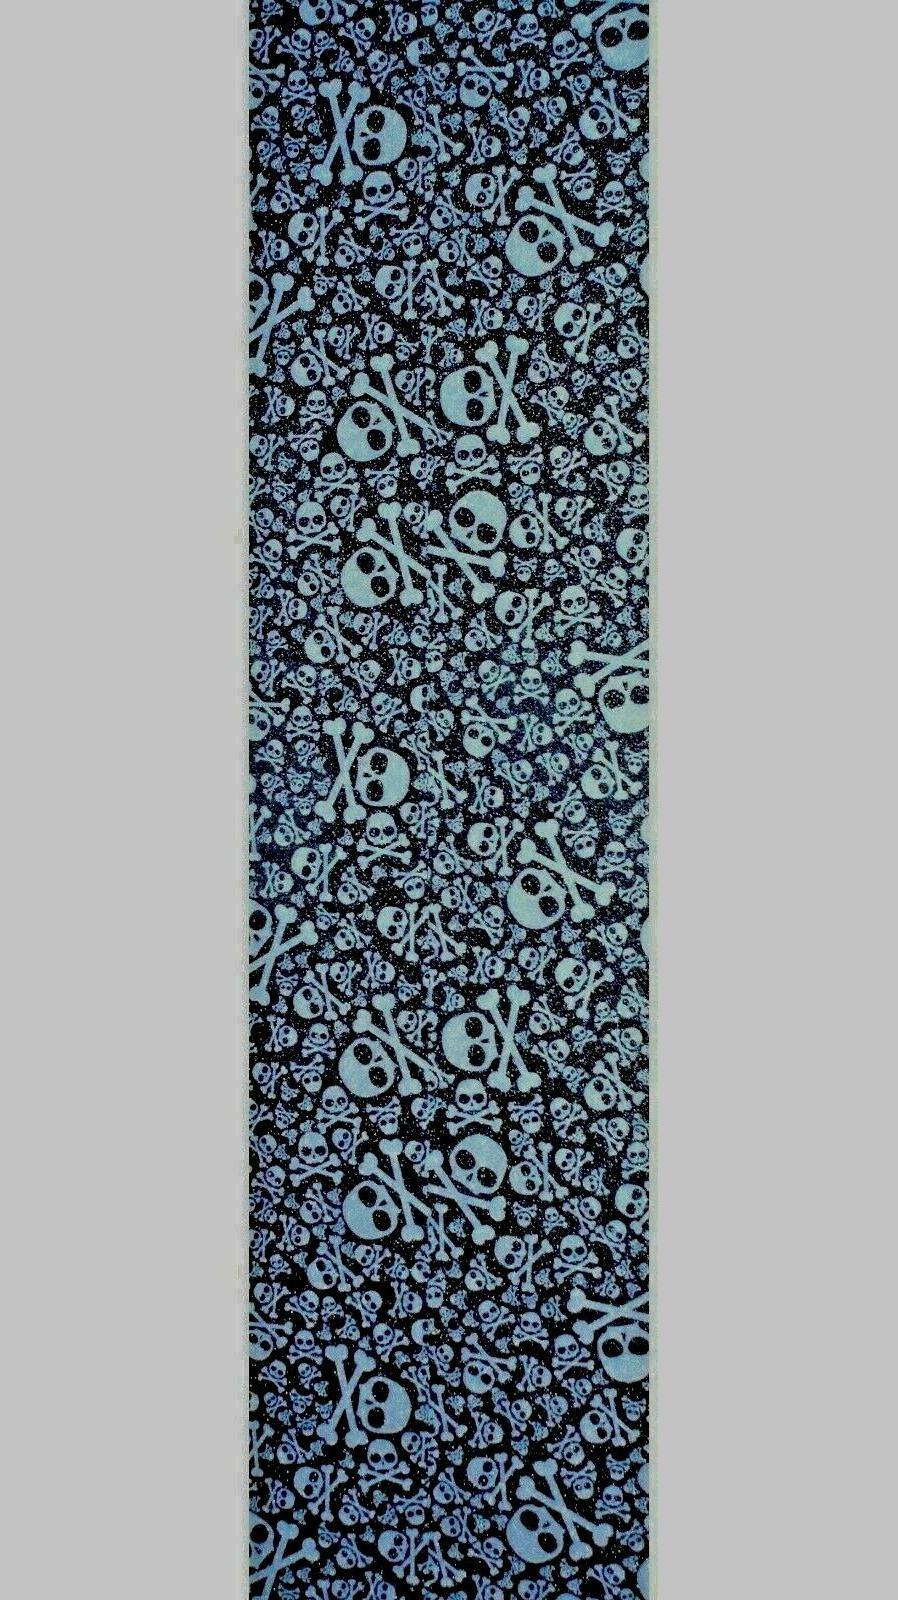 skateboard grip tape skulls 9 x 33